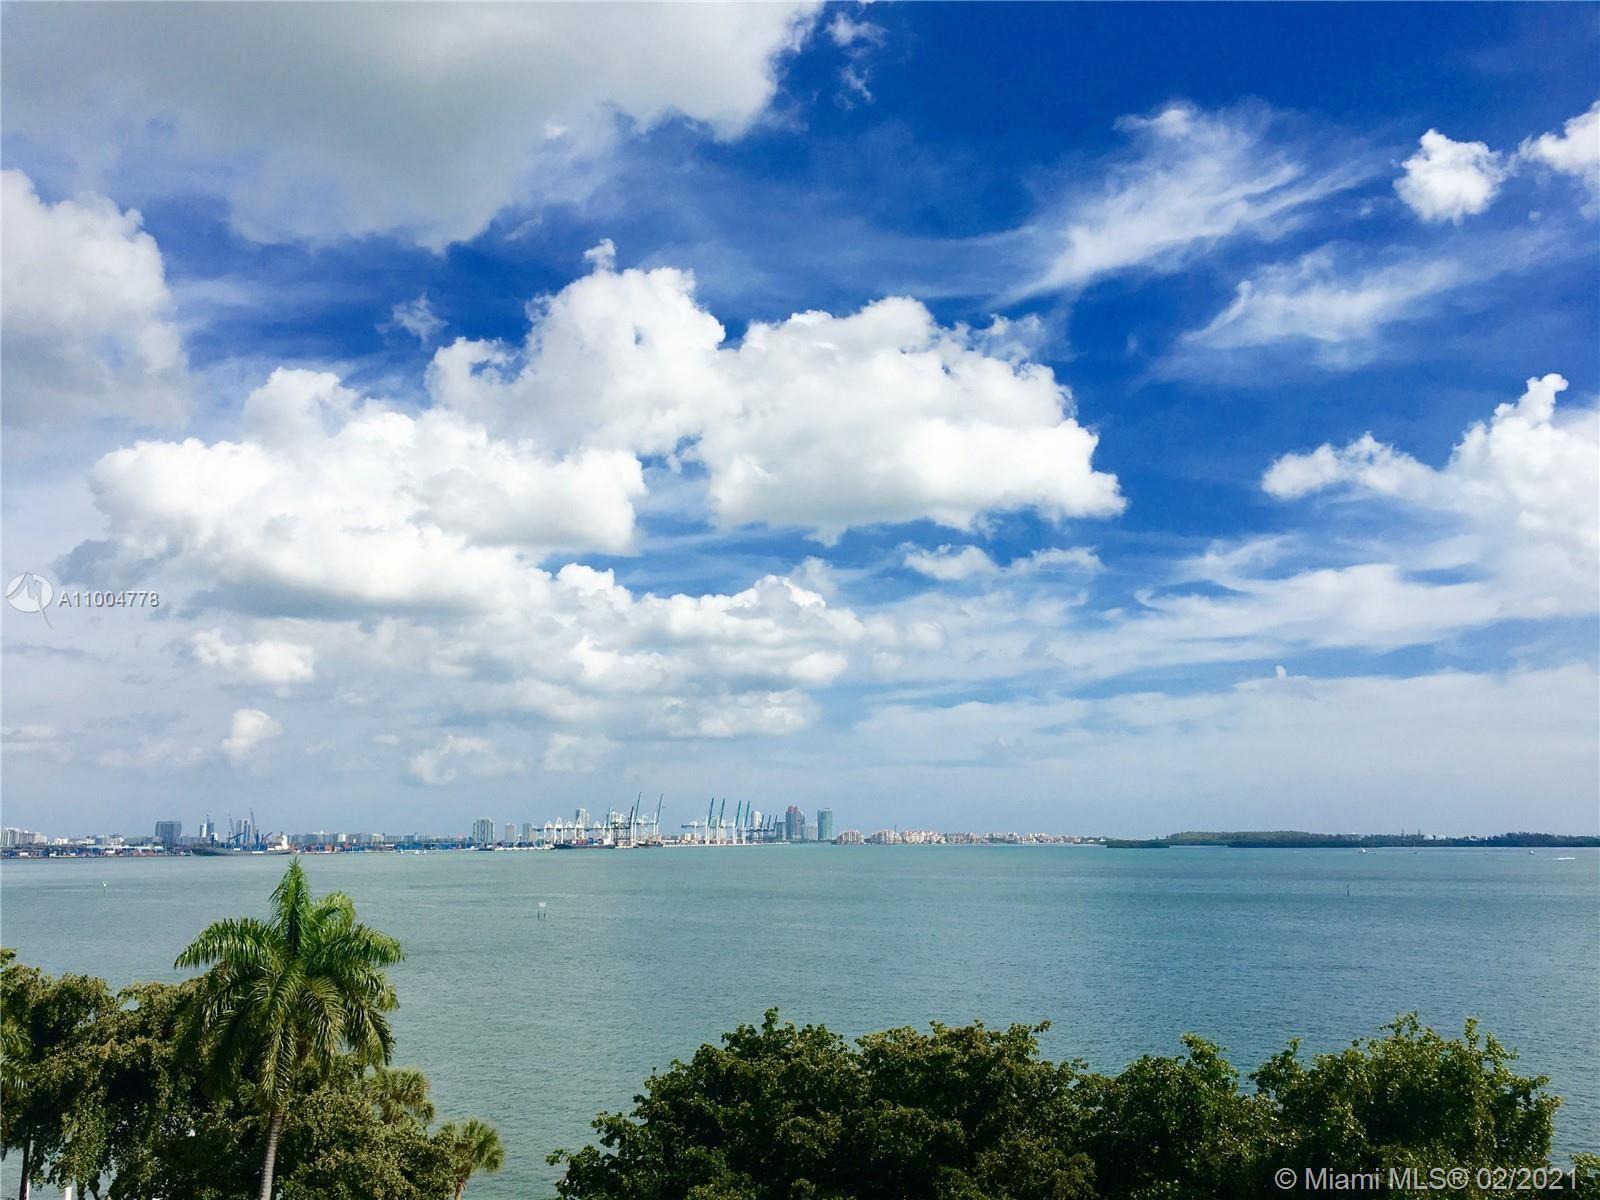 Photo of 1430 Brickell Bay Dr #703, Miami, FL 33131 (MLS # A11004778)